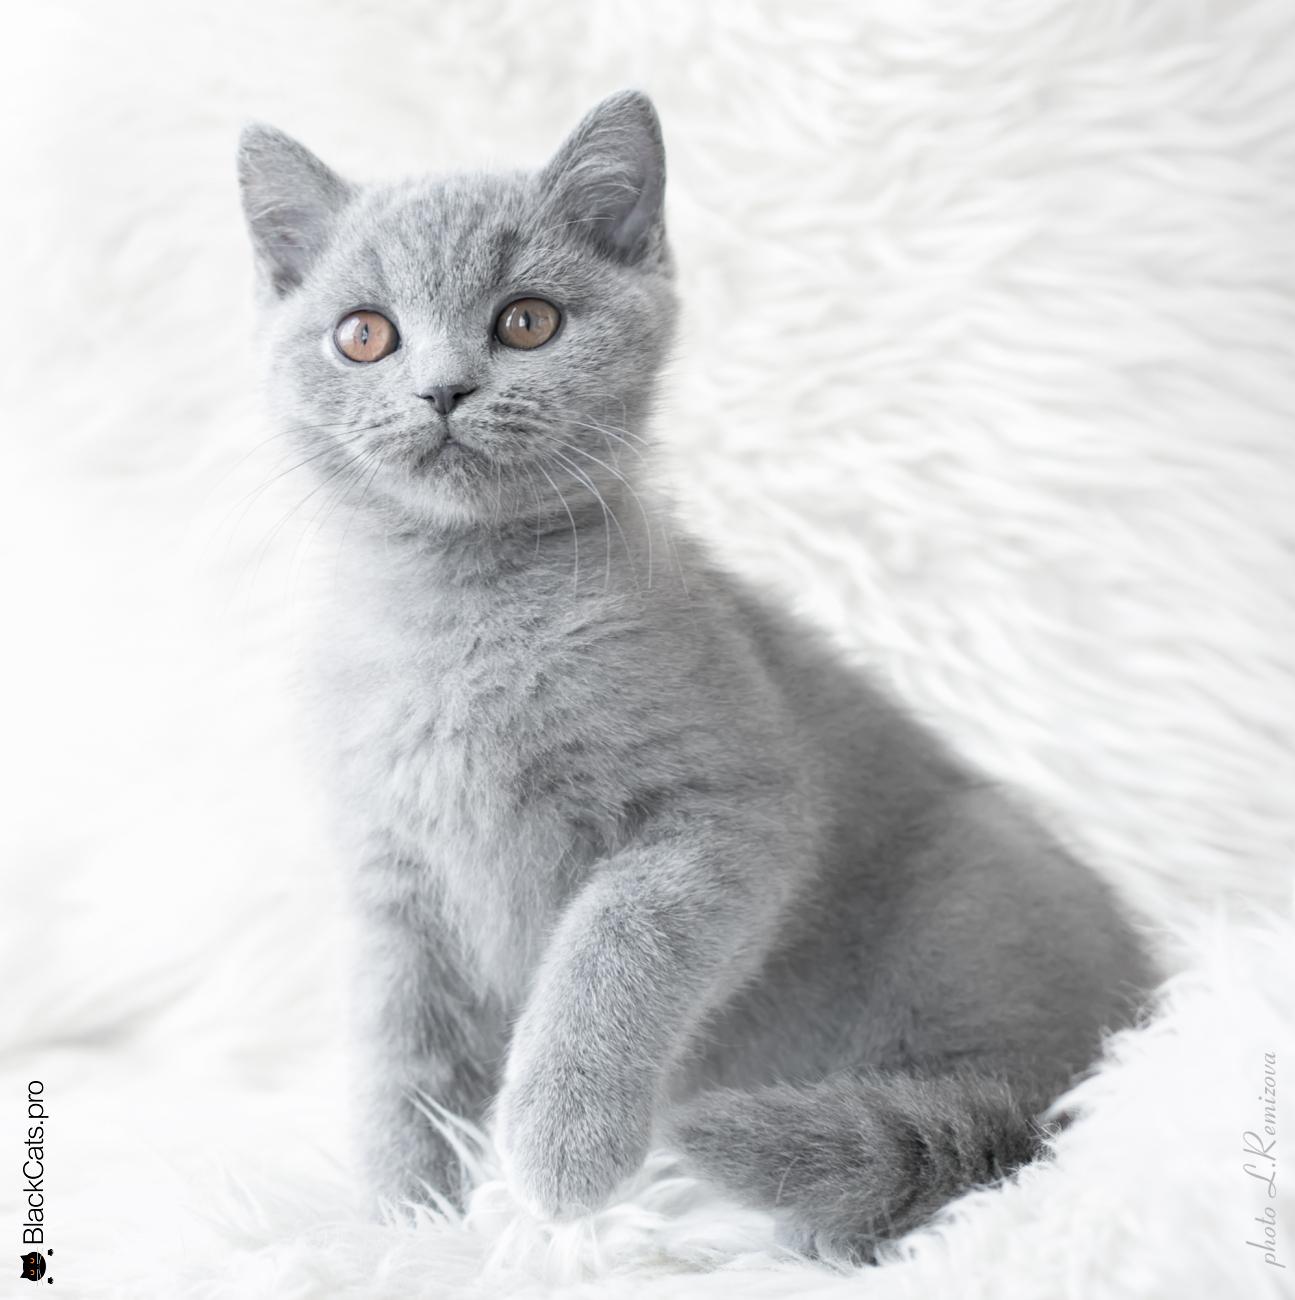 Richelieu Diamond Blue Jetstone 3 months 17 days